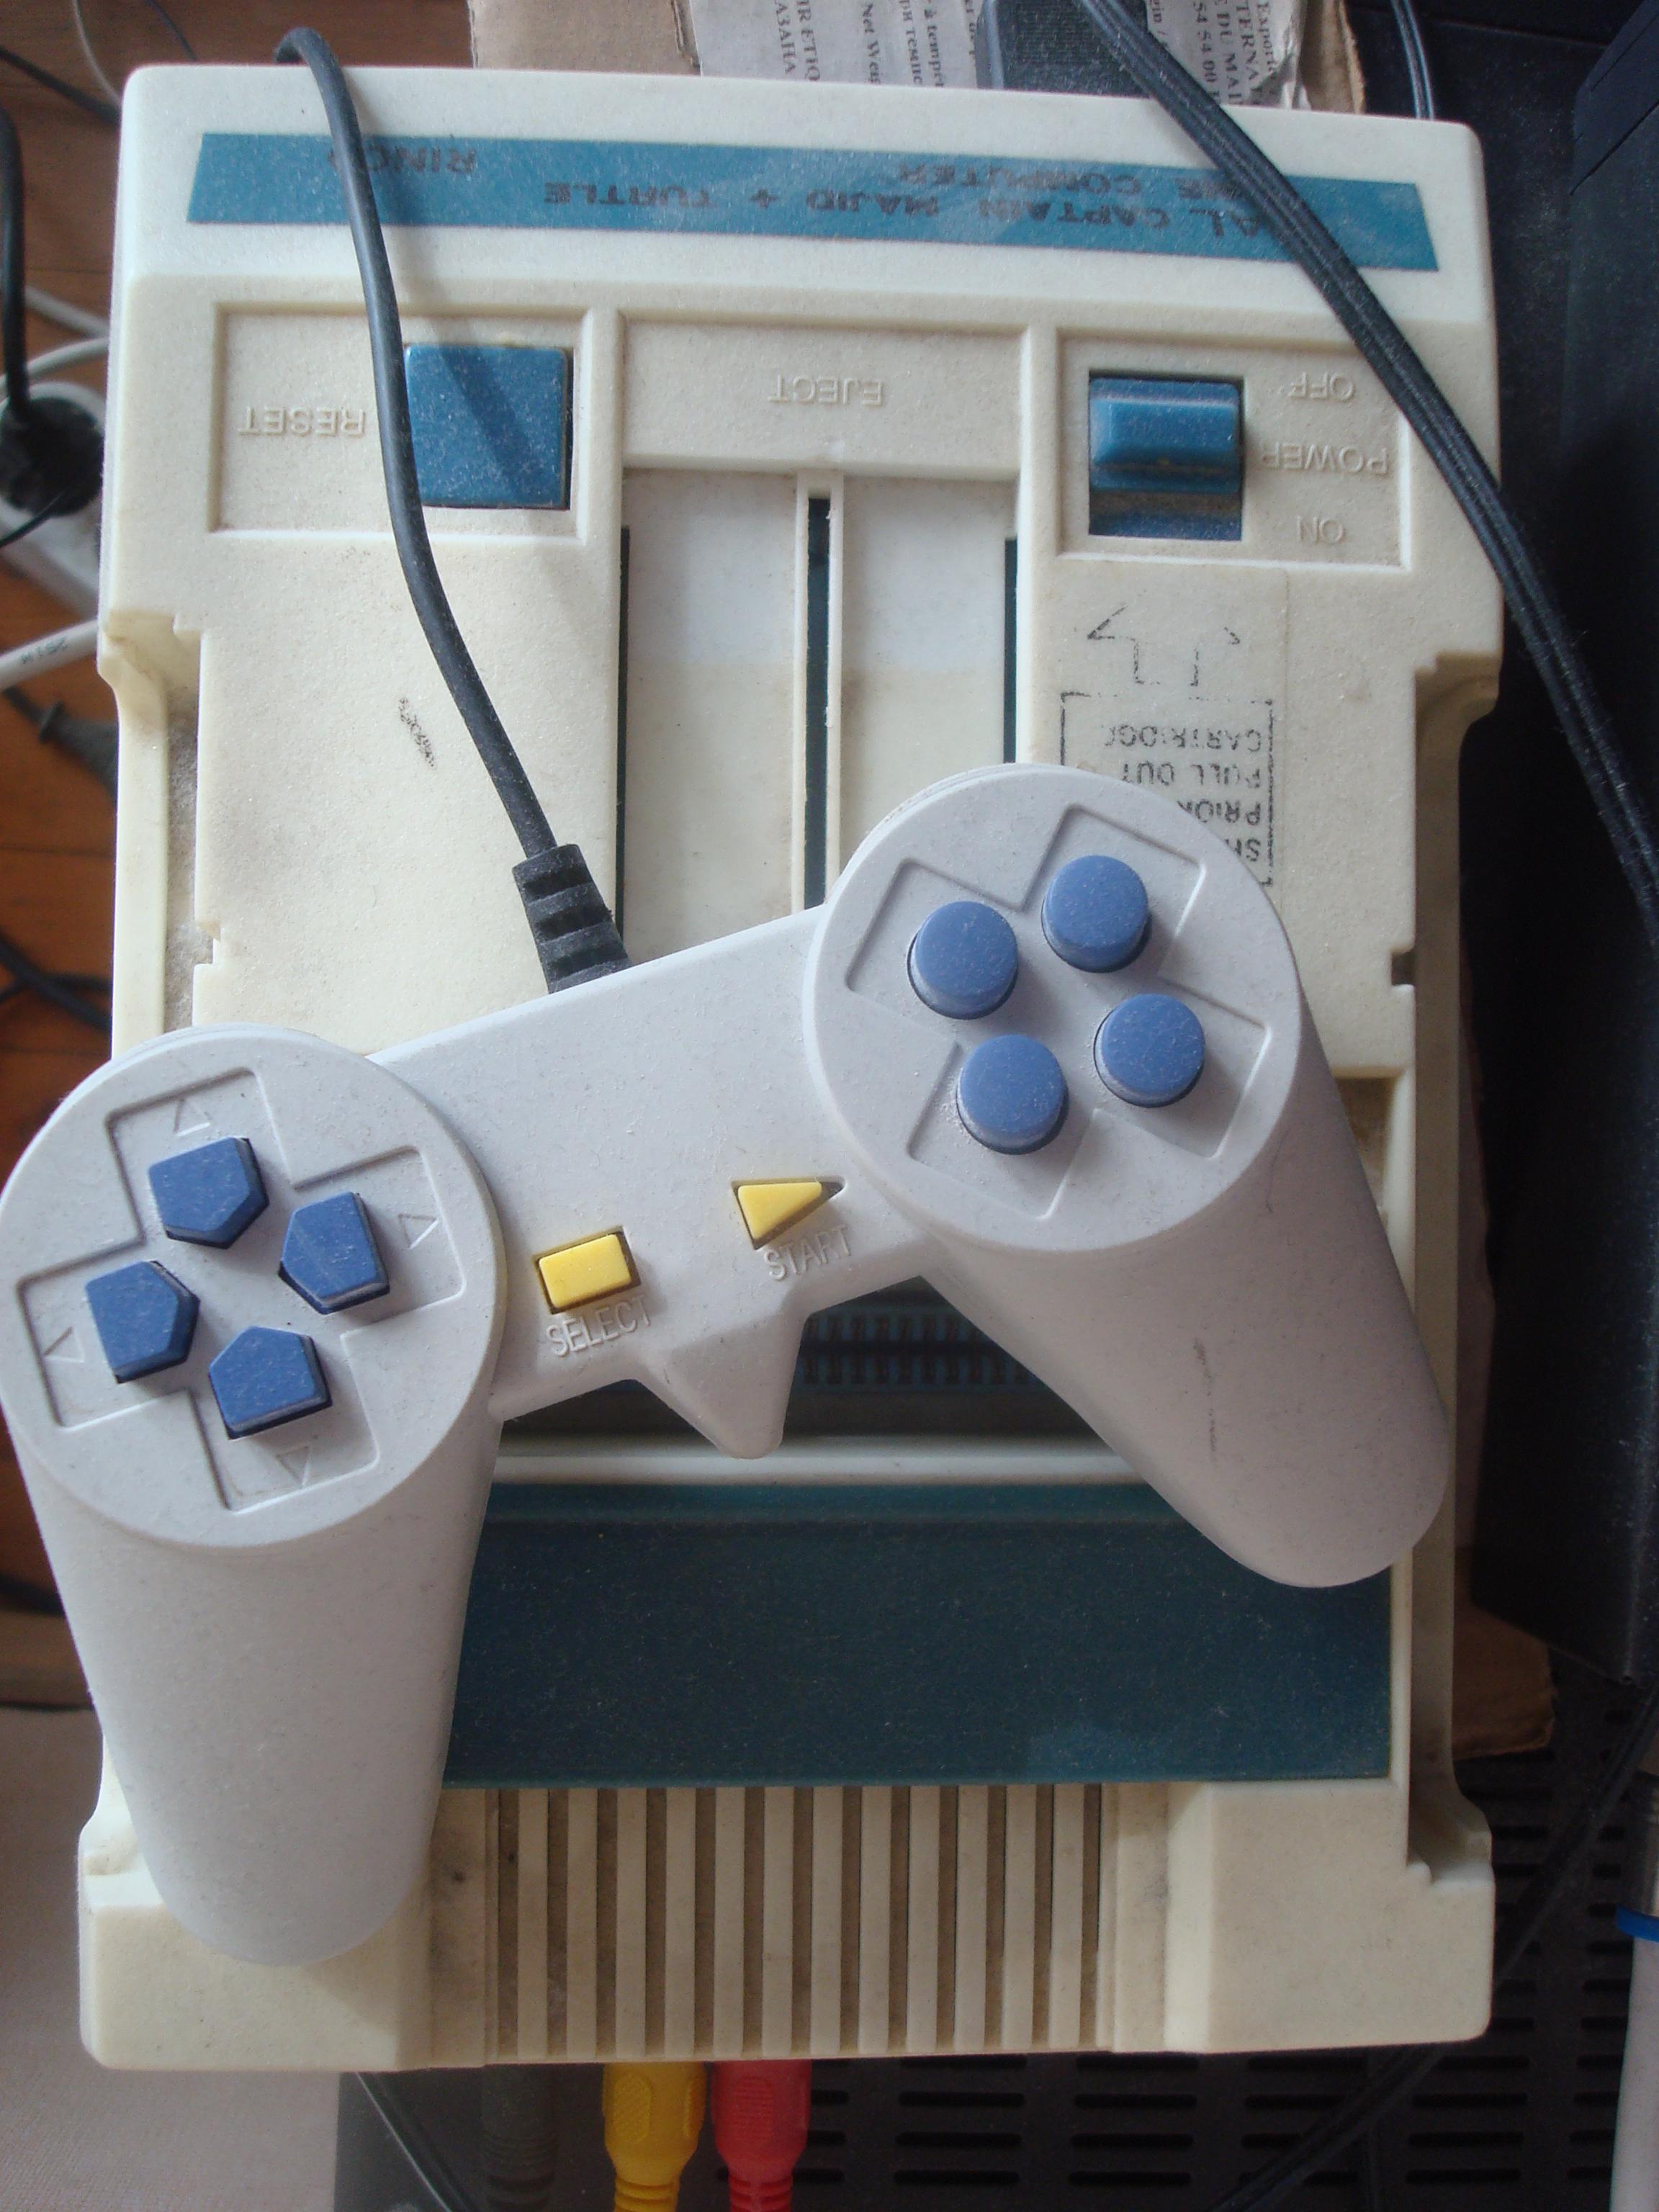 Nintendo arcade game, Amusement, Arcade, Children, Electronics, HQ Photo